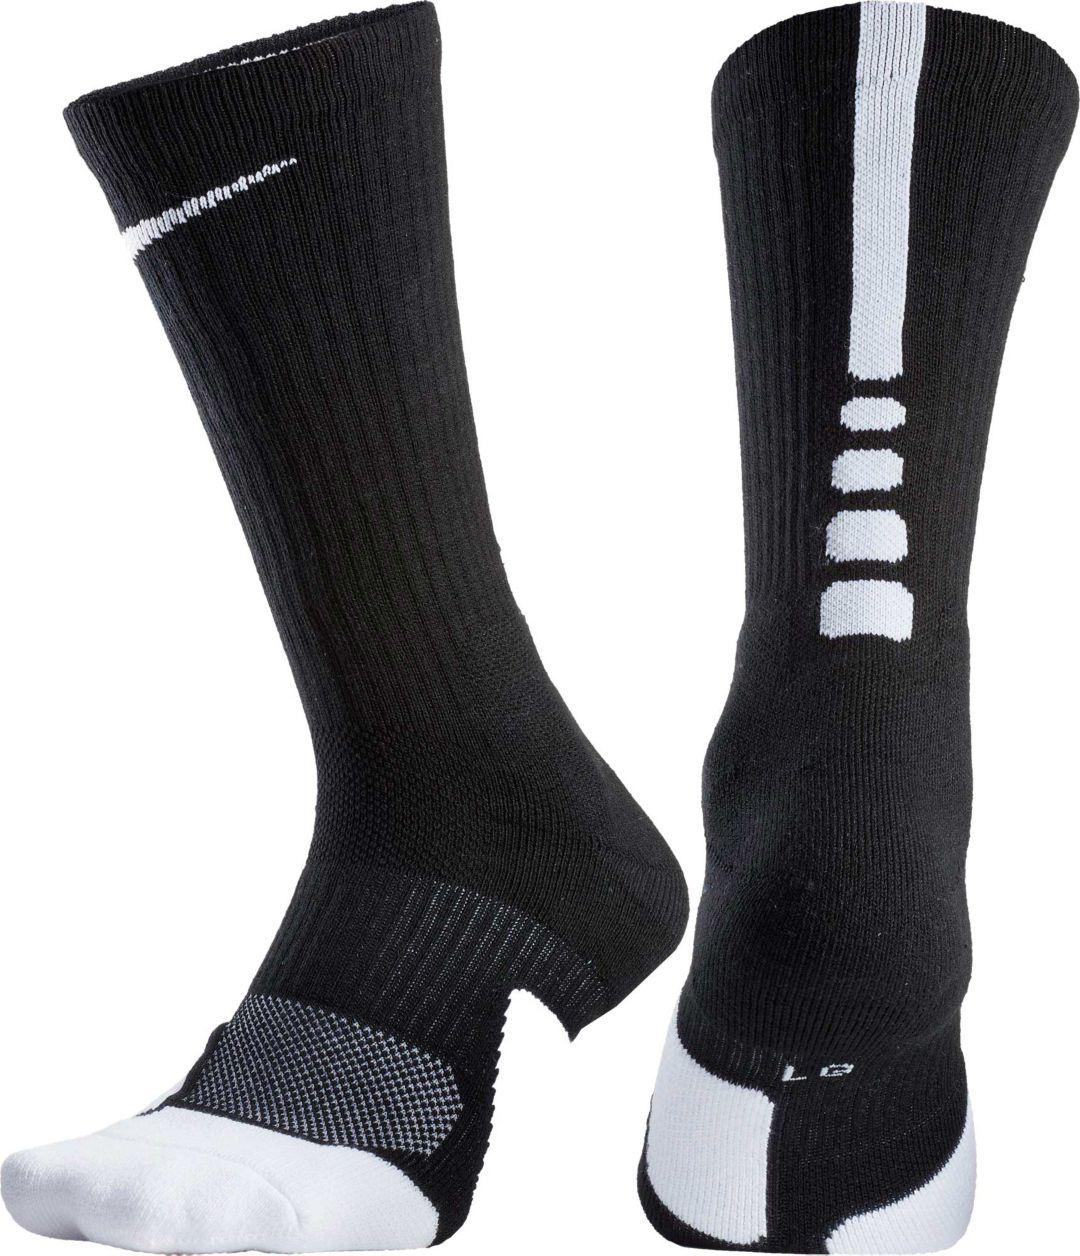 947ca891f Nike Dry Elite 1.5 Crew Basketball Socks. noImageFound. Previous